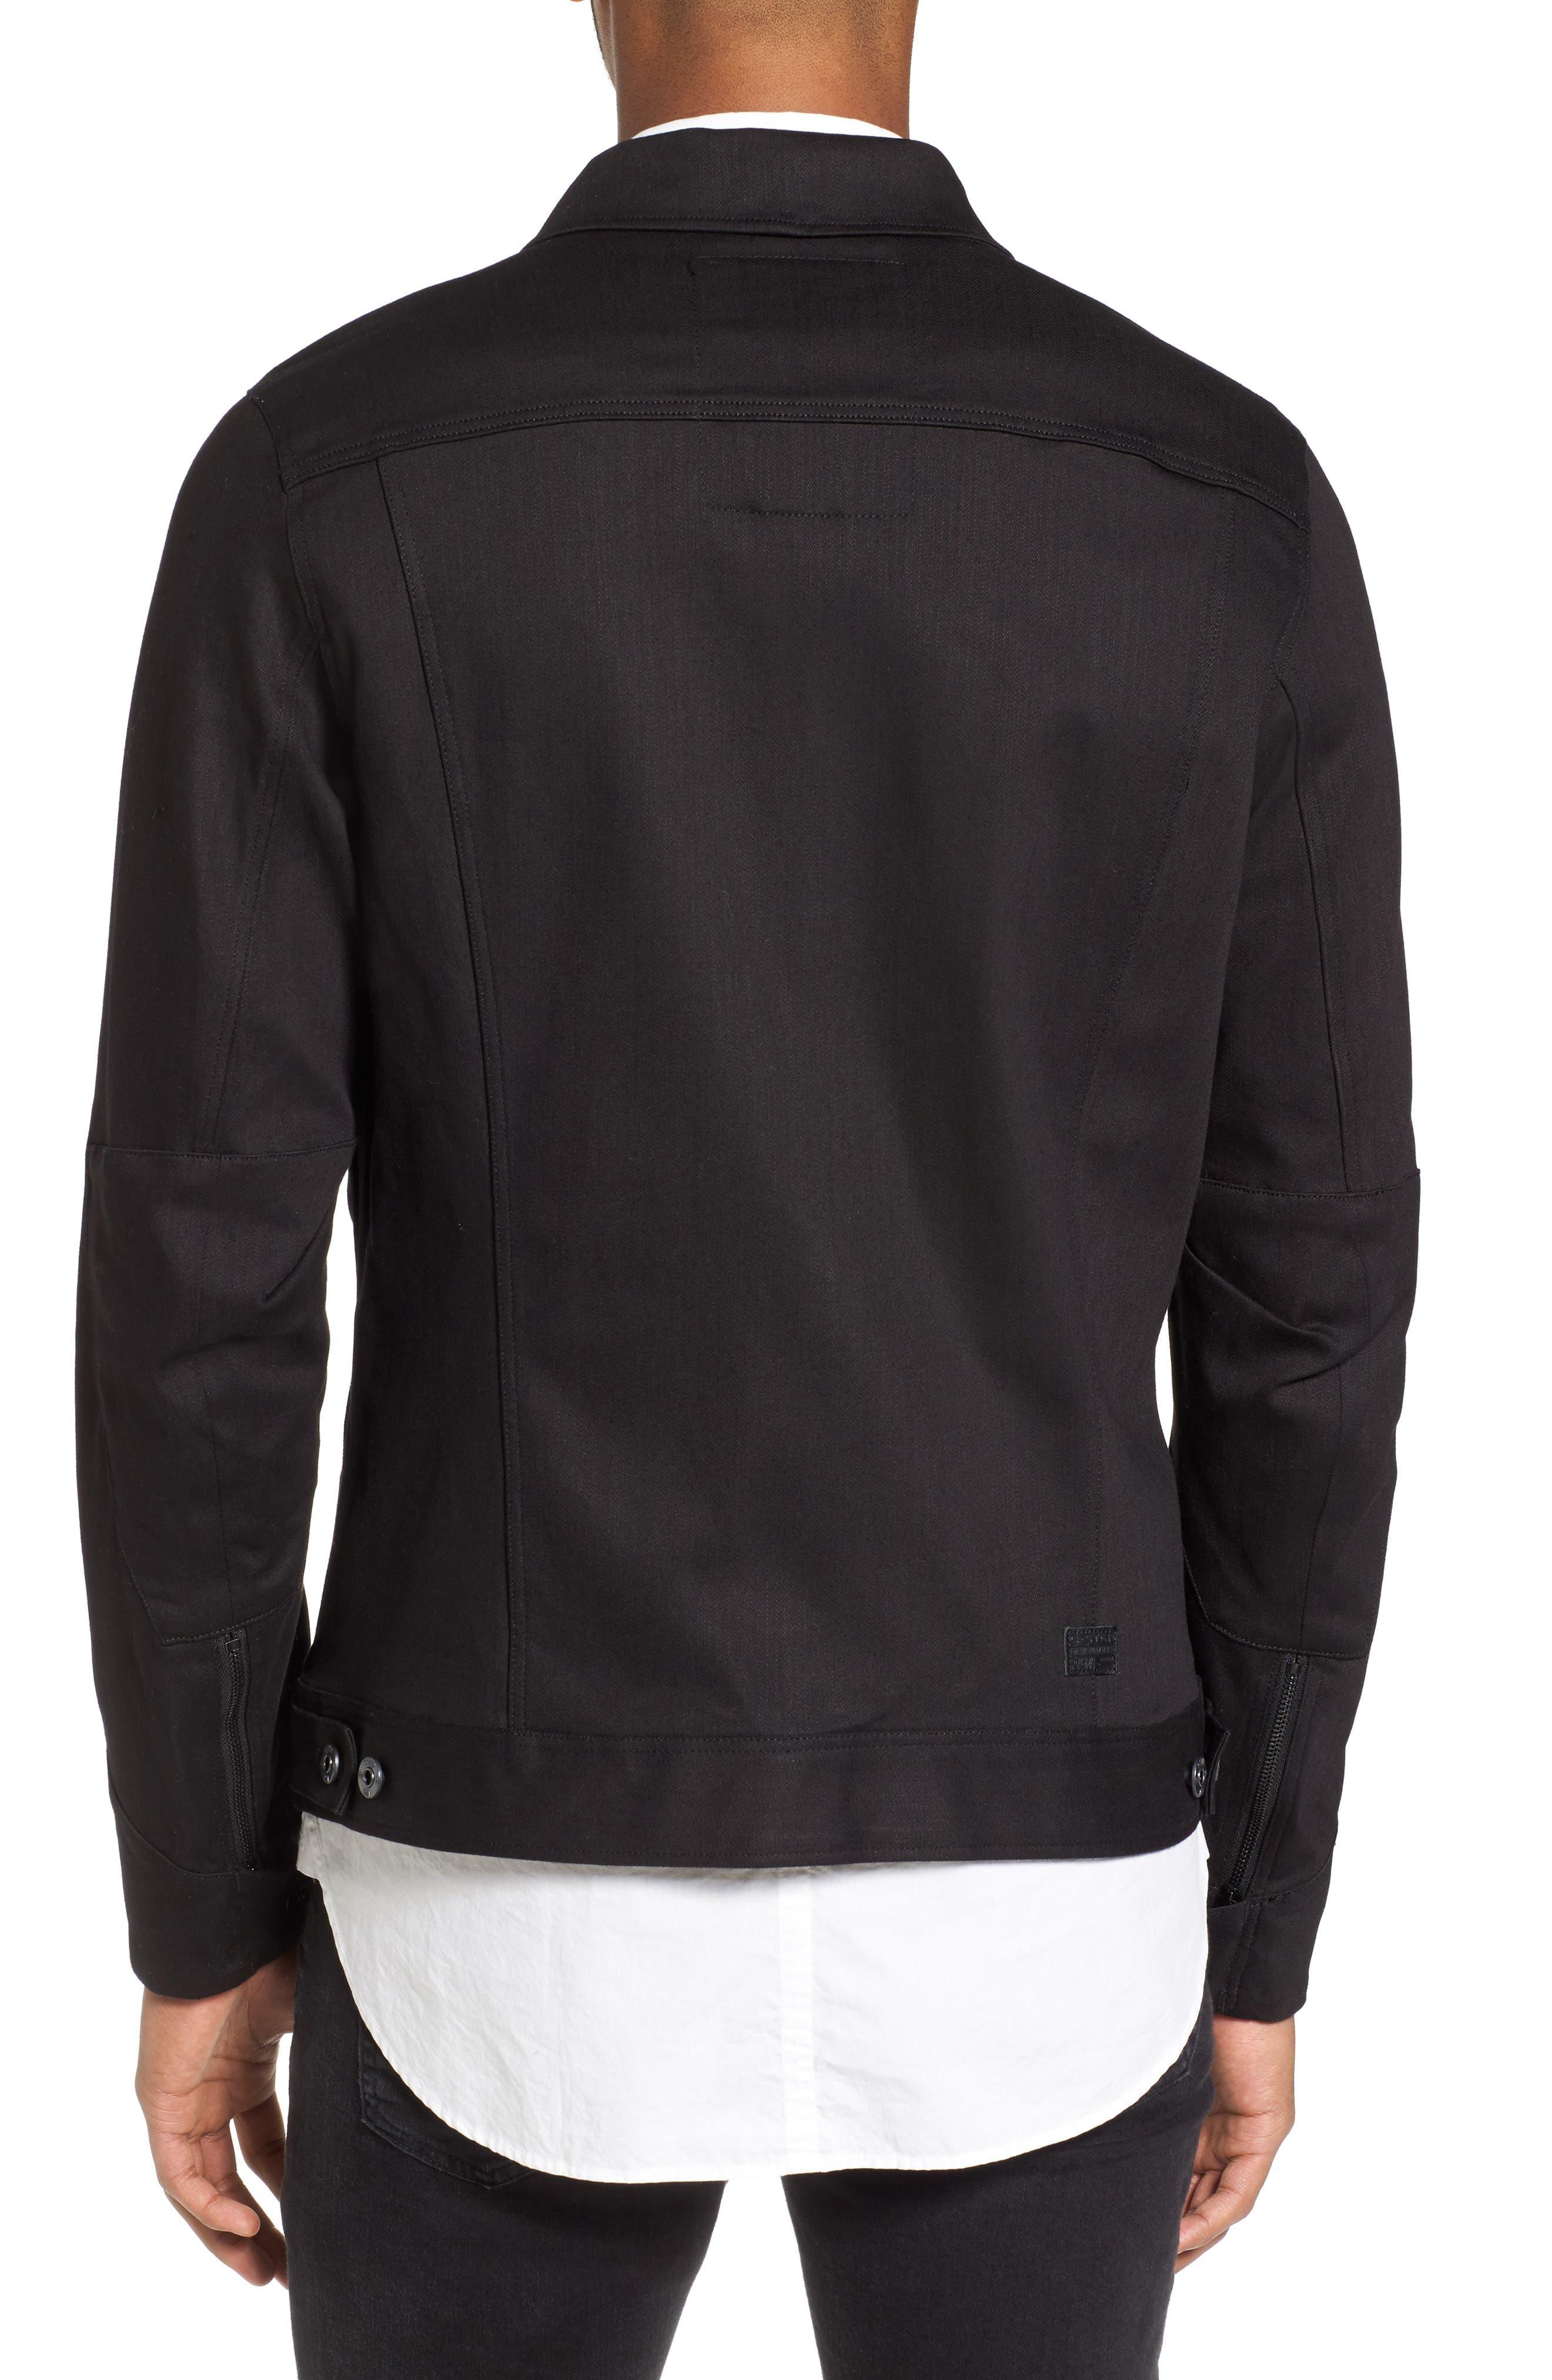 Vodan 3D Slim Jacket,                             Alternate thumbnail 2, color,                             401